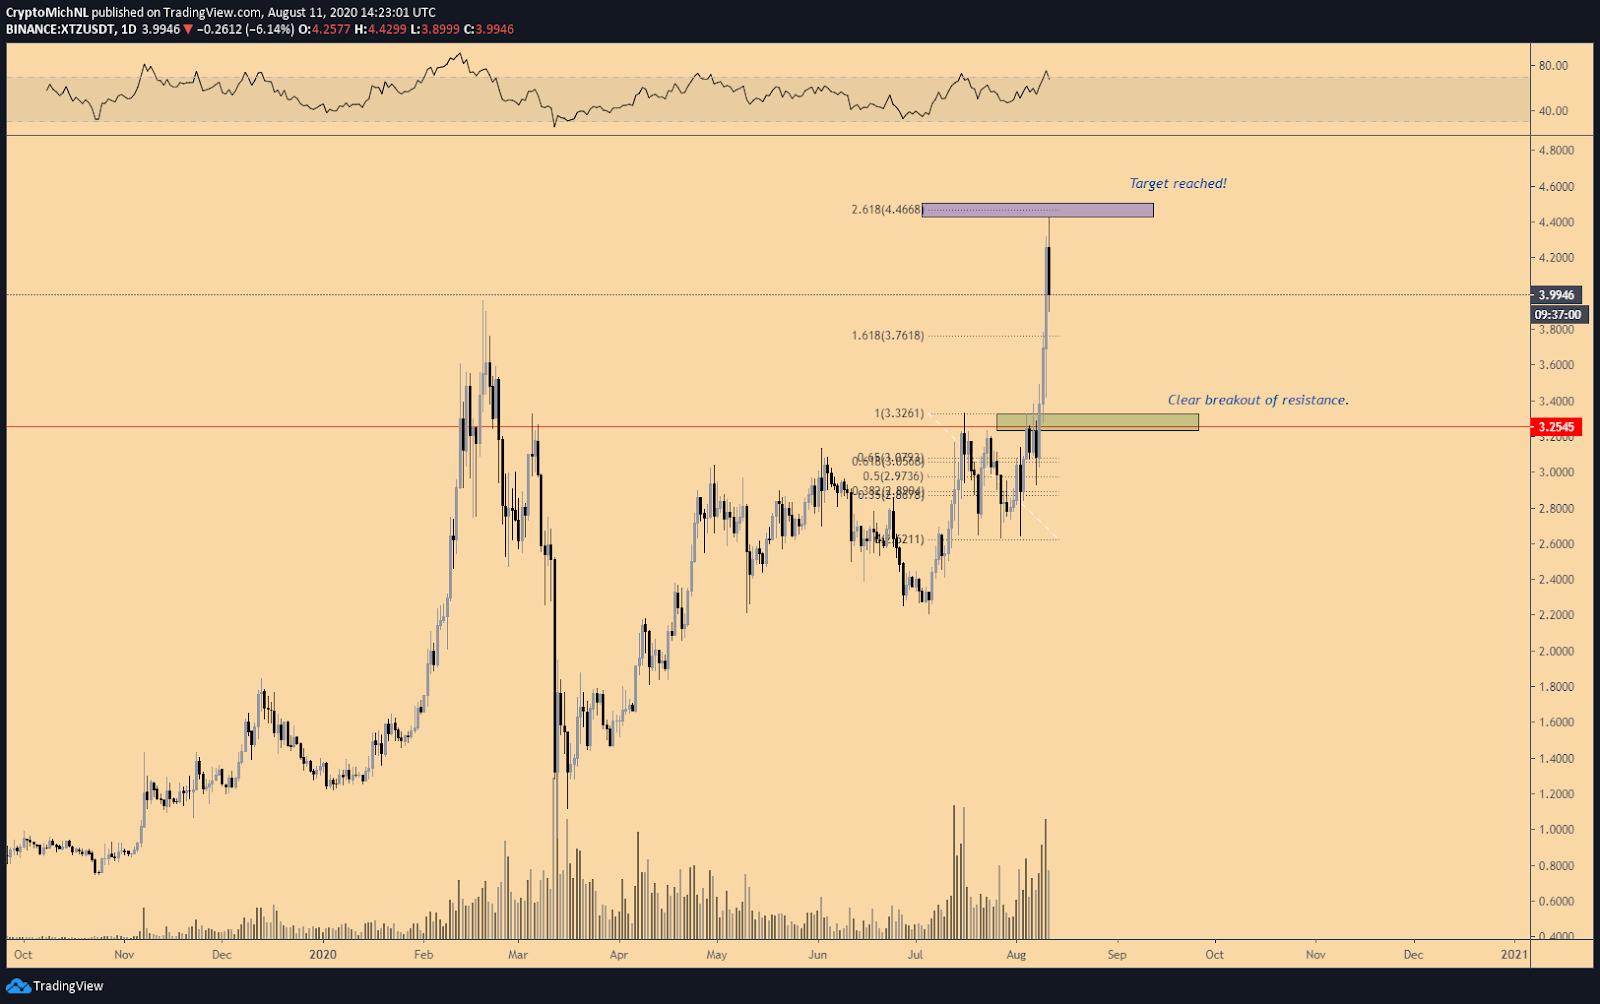 XTZ/USDT 1-day chart